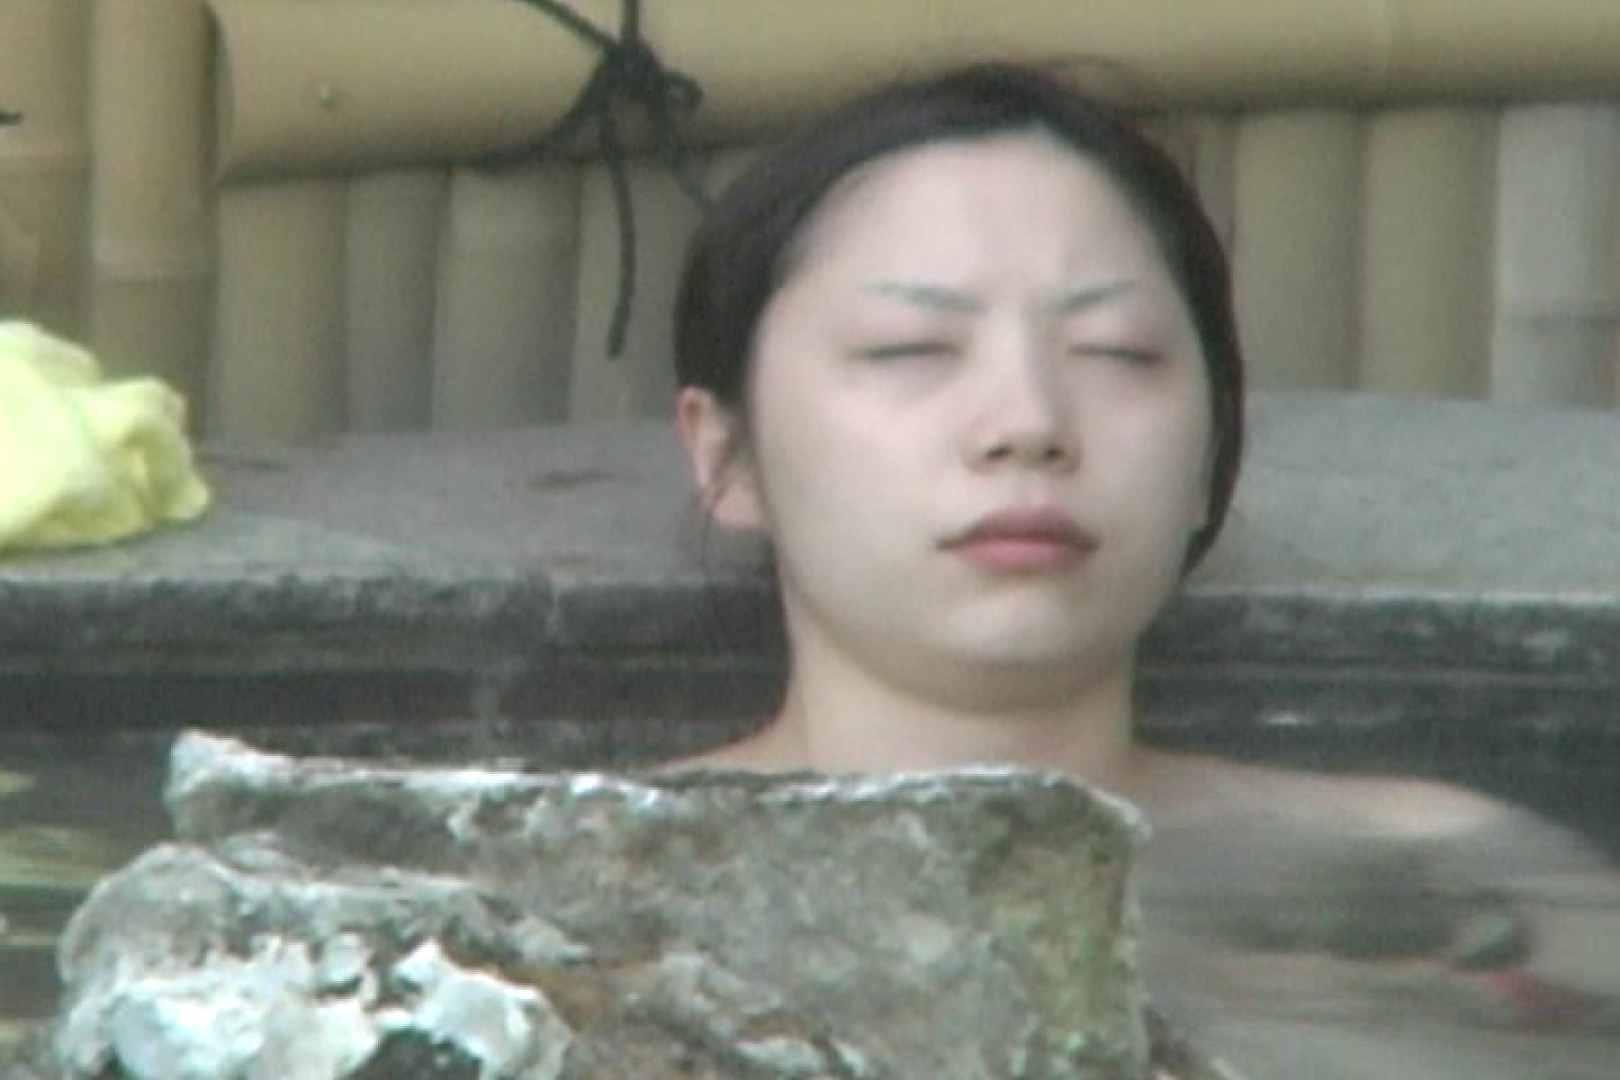 Aquaな露天風呂Vol.596 盗撮シリーズ | 露天風呂編  113PIX 73